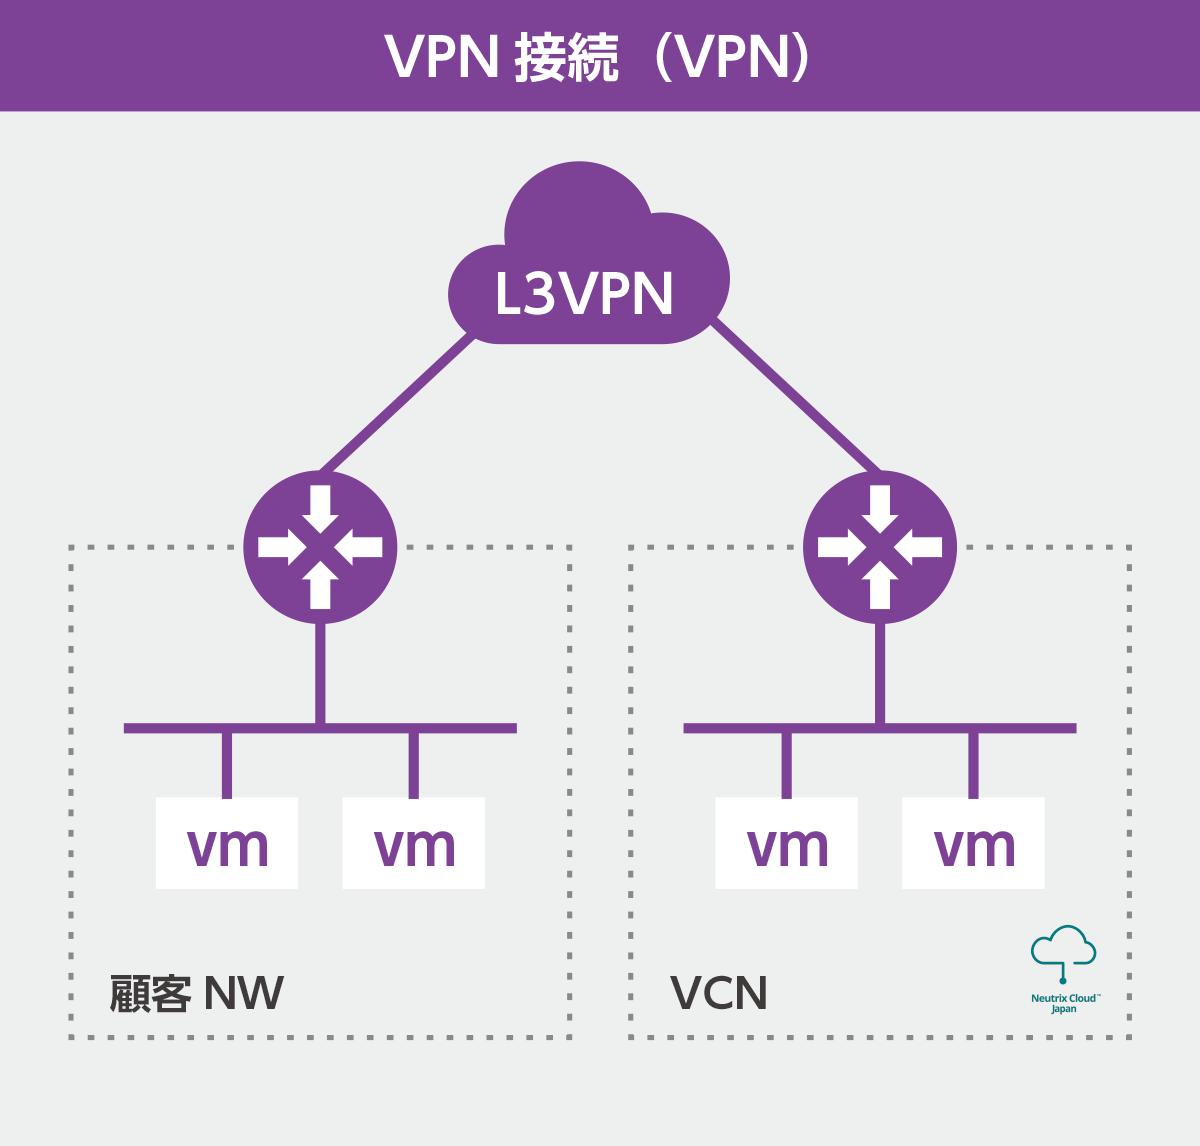 VPN接続(VPN)